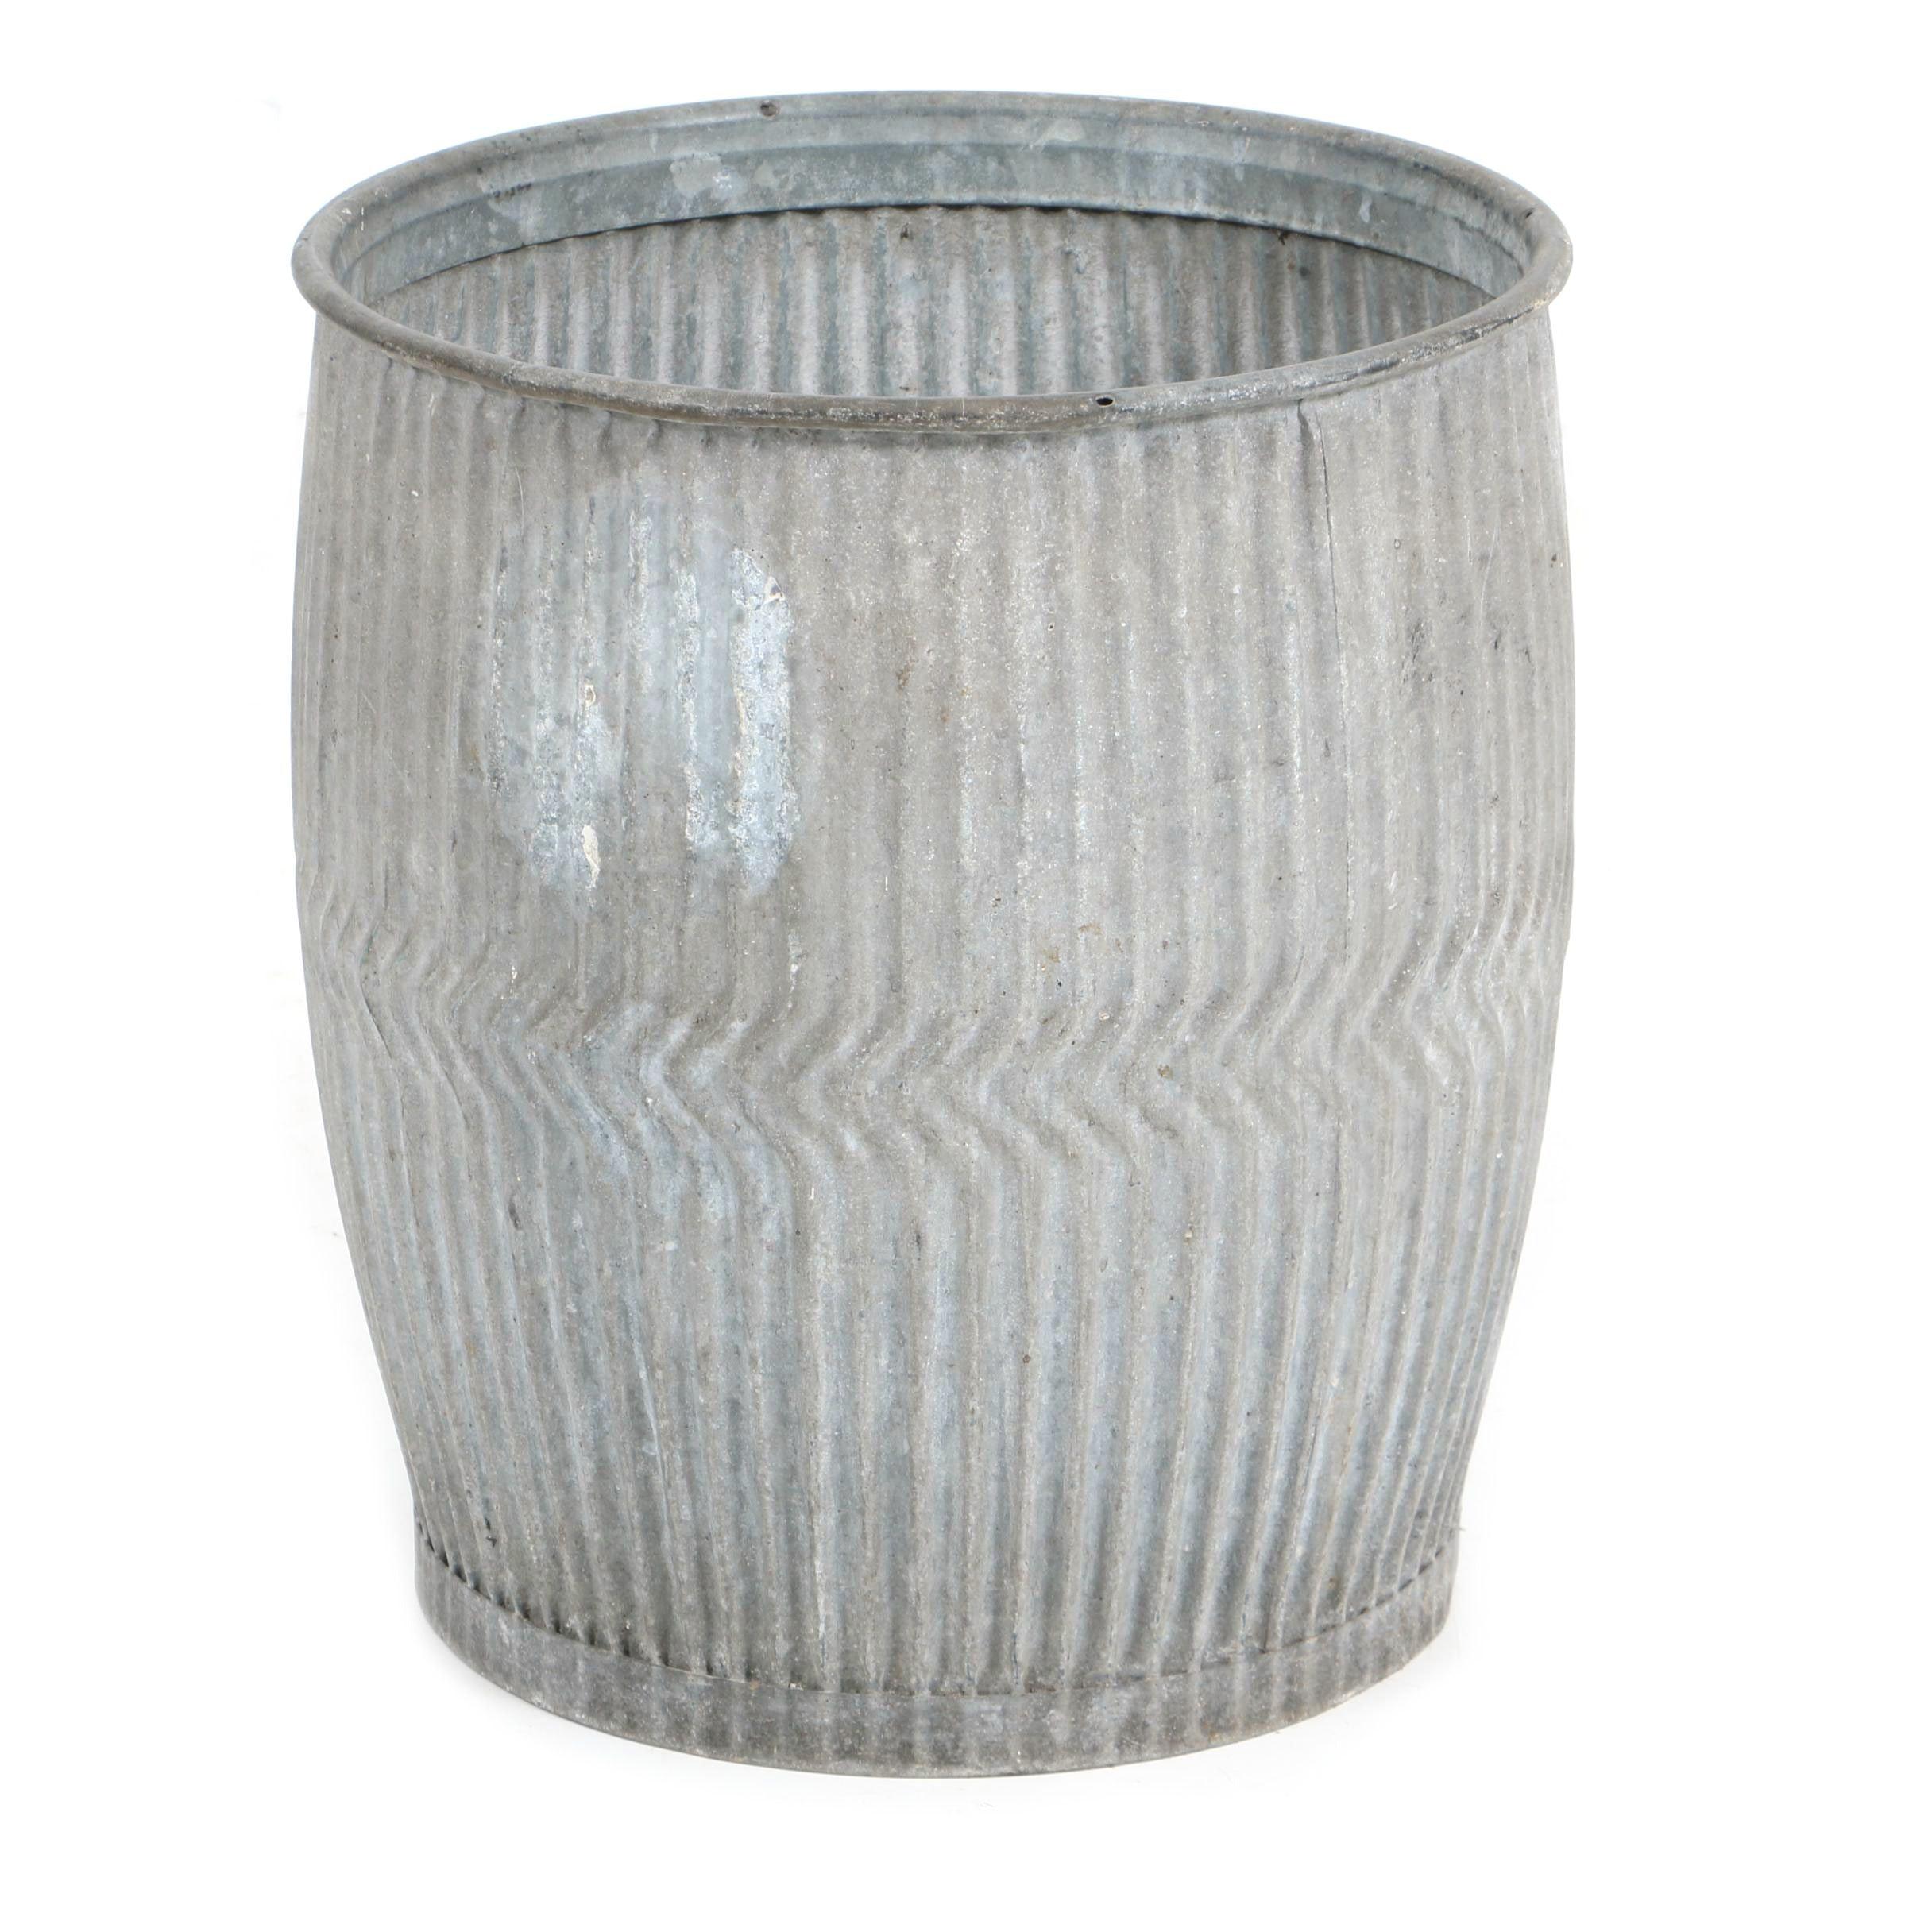 20th Century English Zinc Laundry Barrel